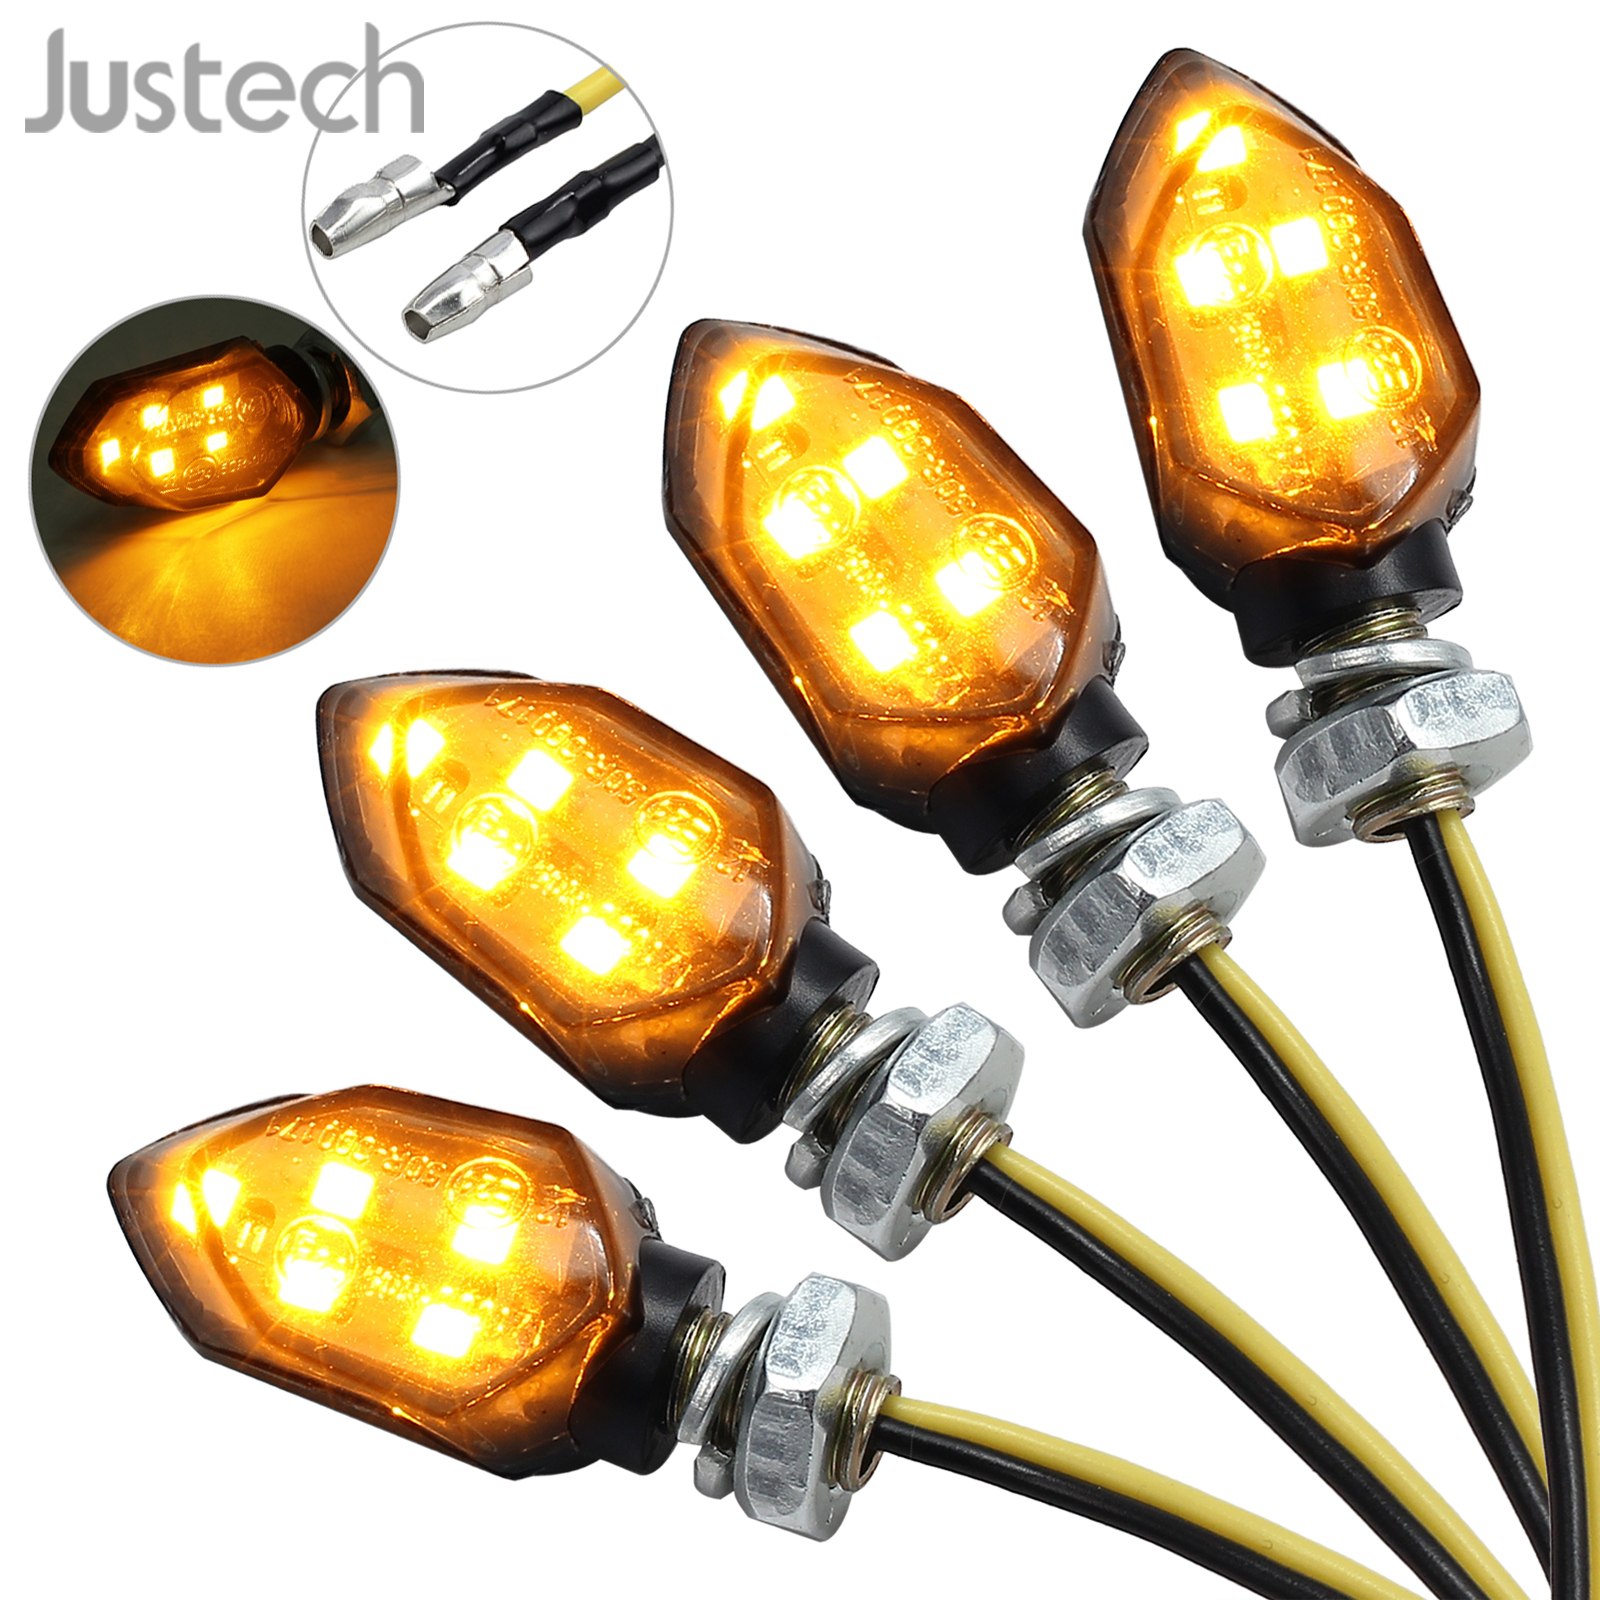 Justech 4pcs Universal Waterproof Motorcycle Motorbike 5LED Micro Turn Signal Indicator Amber Light Metal DC 12V